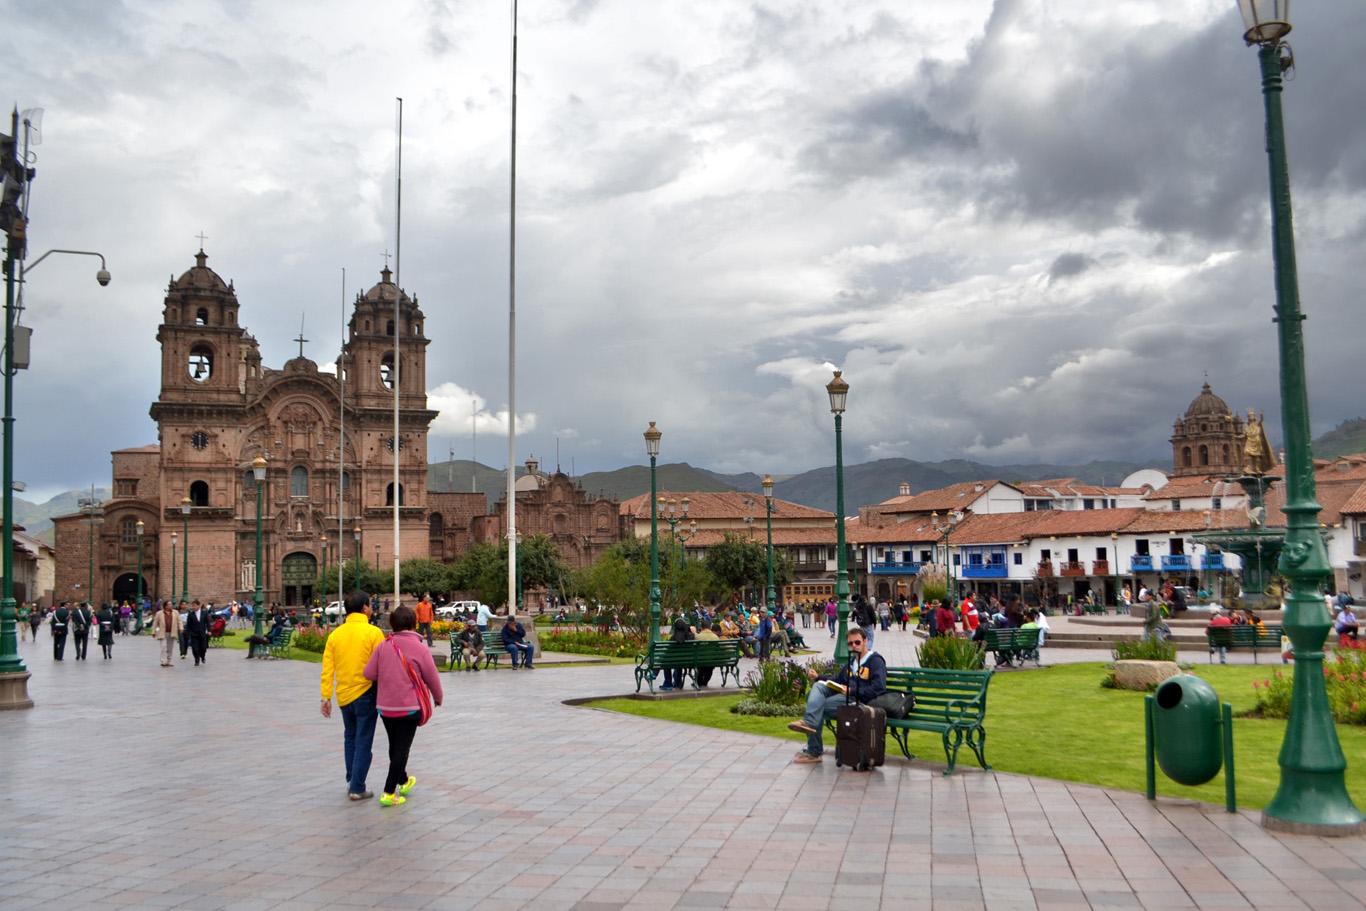 Church of La Compania de Jesus, Plaza de Armas